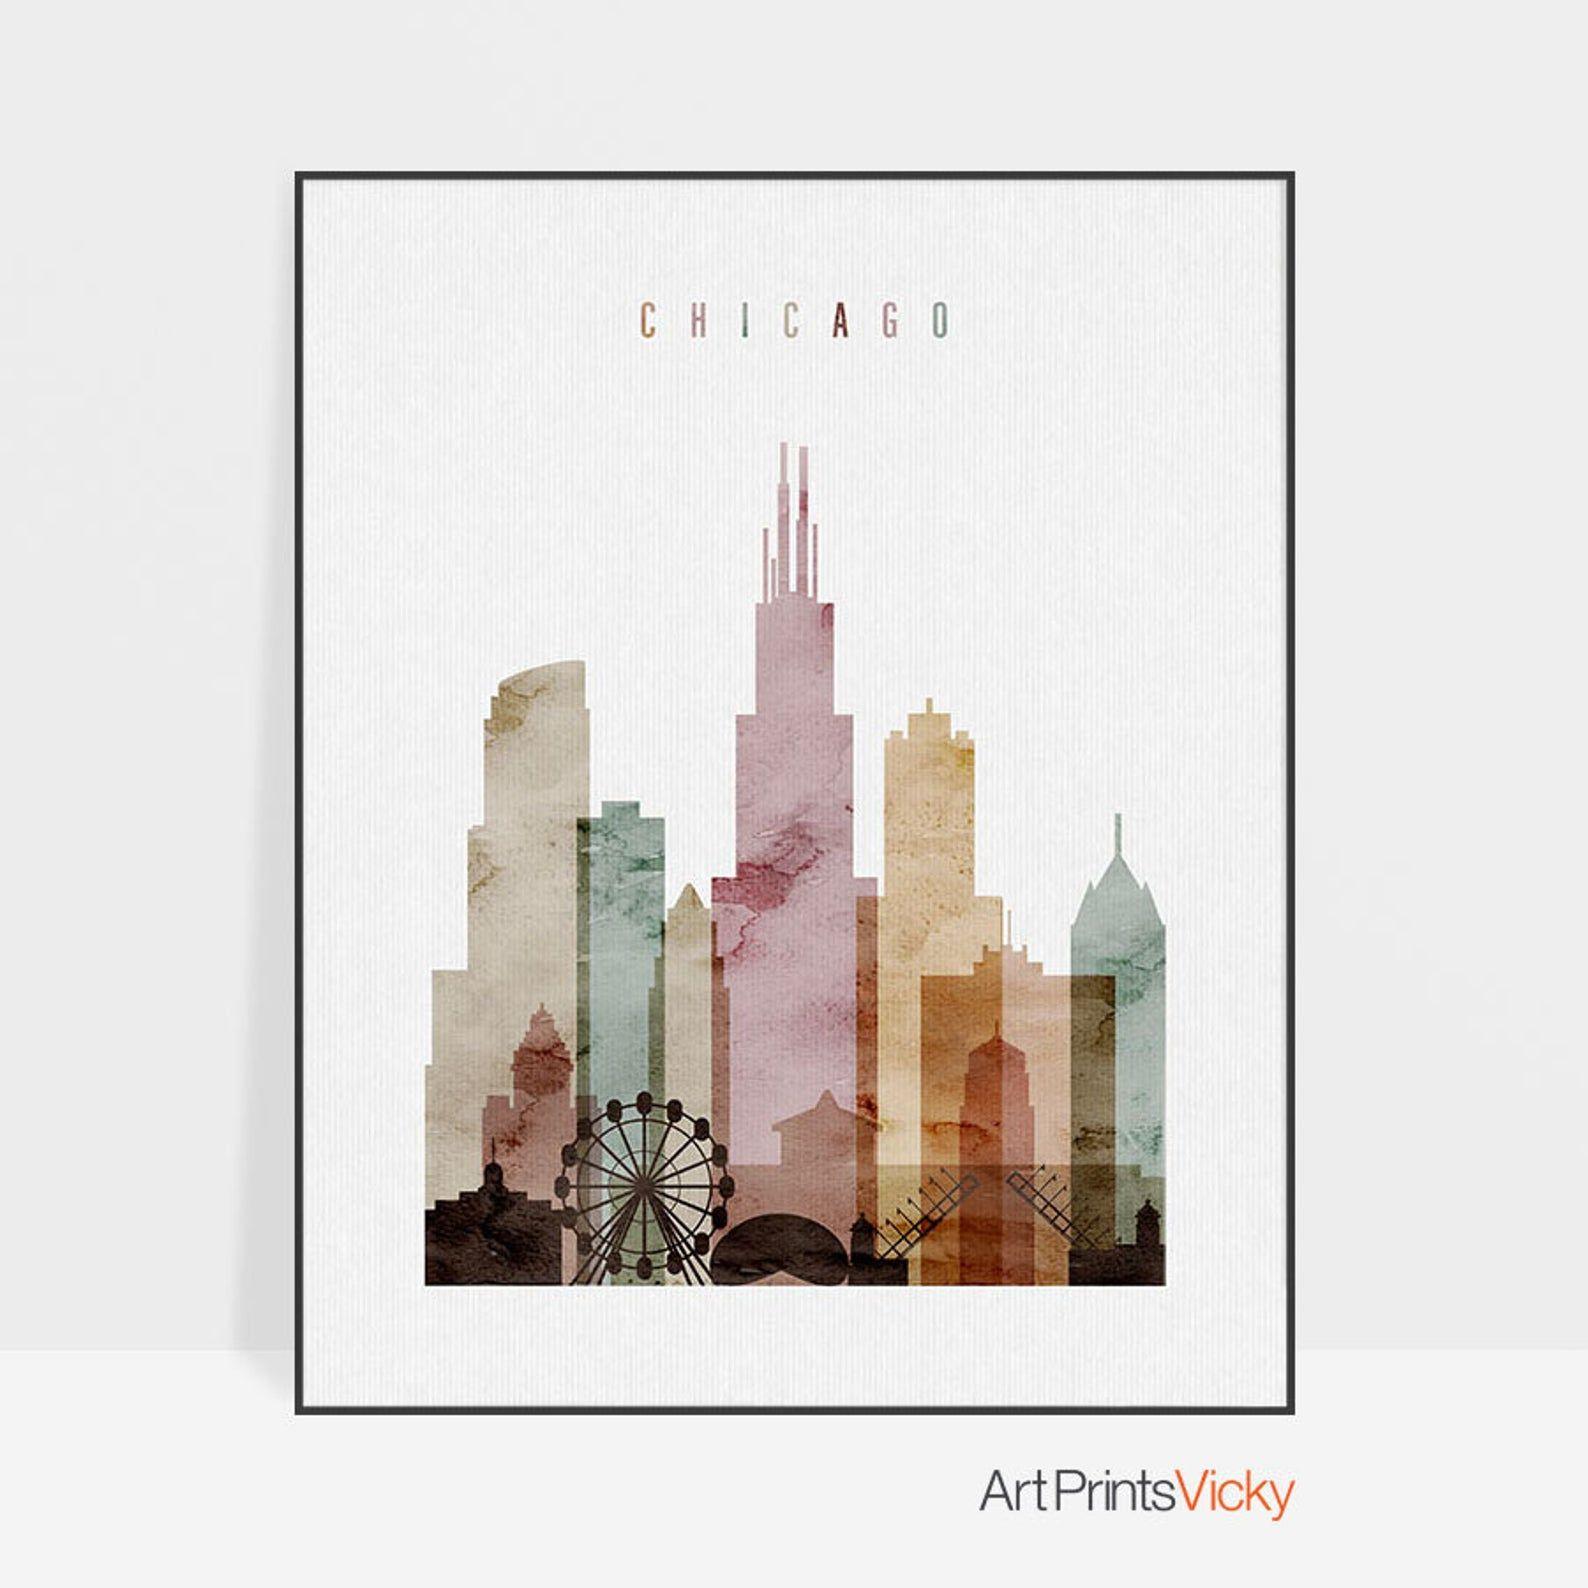 Chicago skyline, Chicago art print, Chicago poster, wall